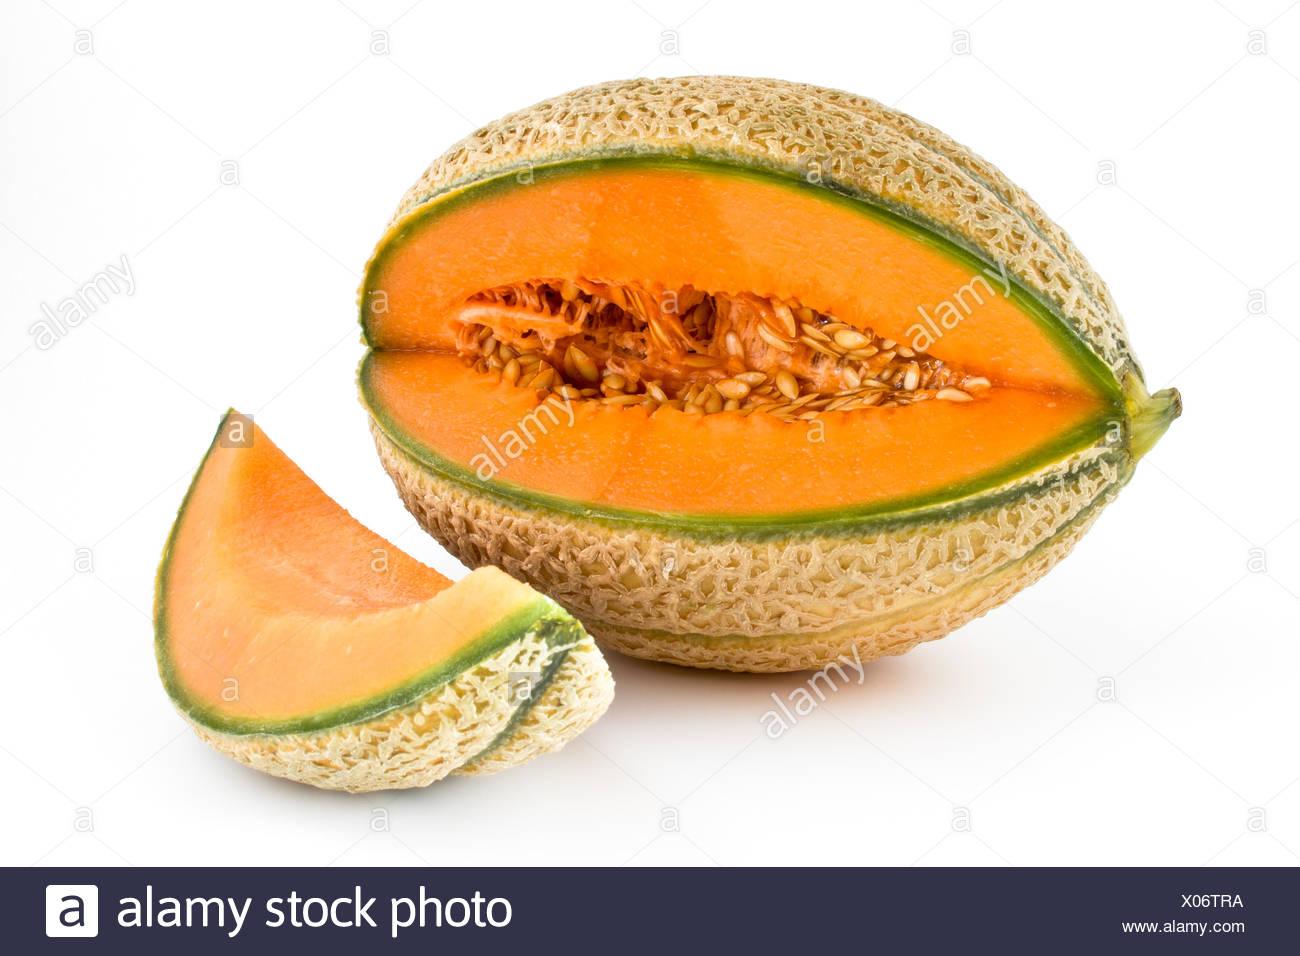 Sugar Melon Stock Photos & Sugar Melon Stock Images - Alamy